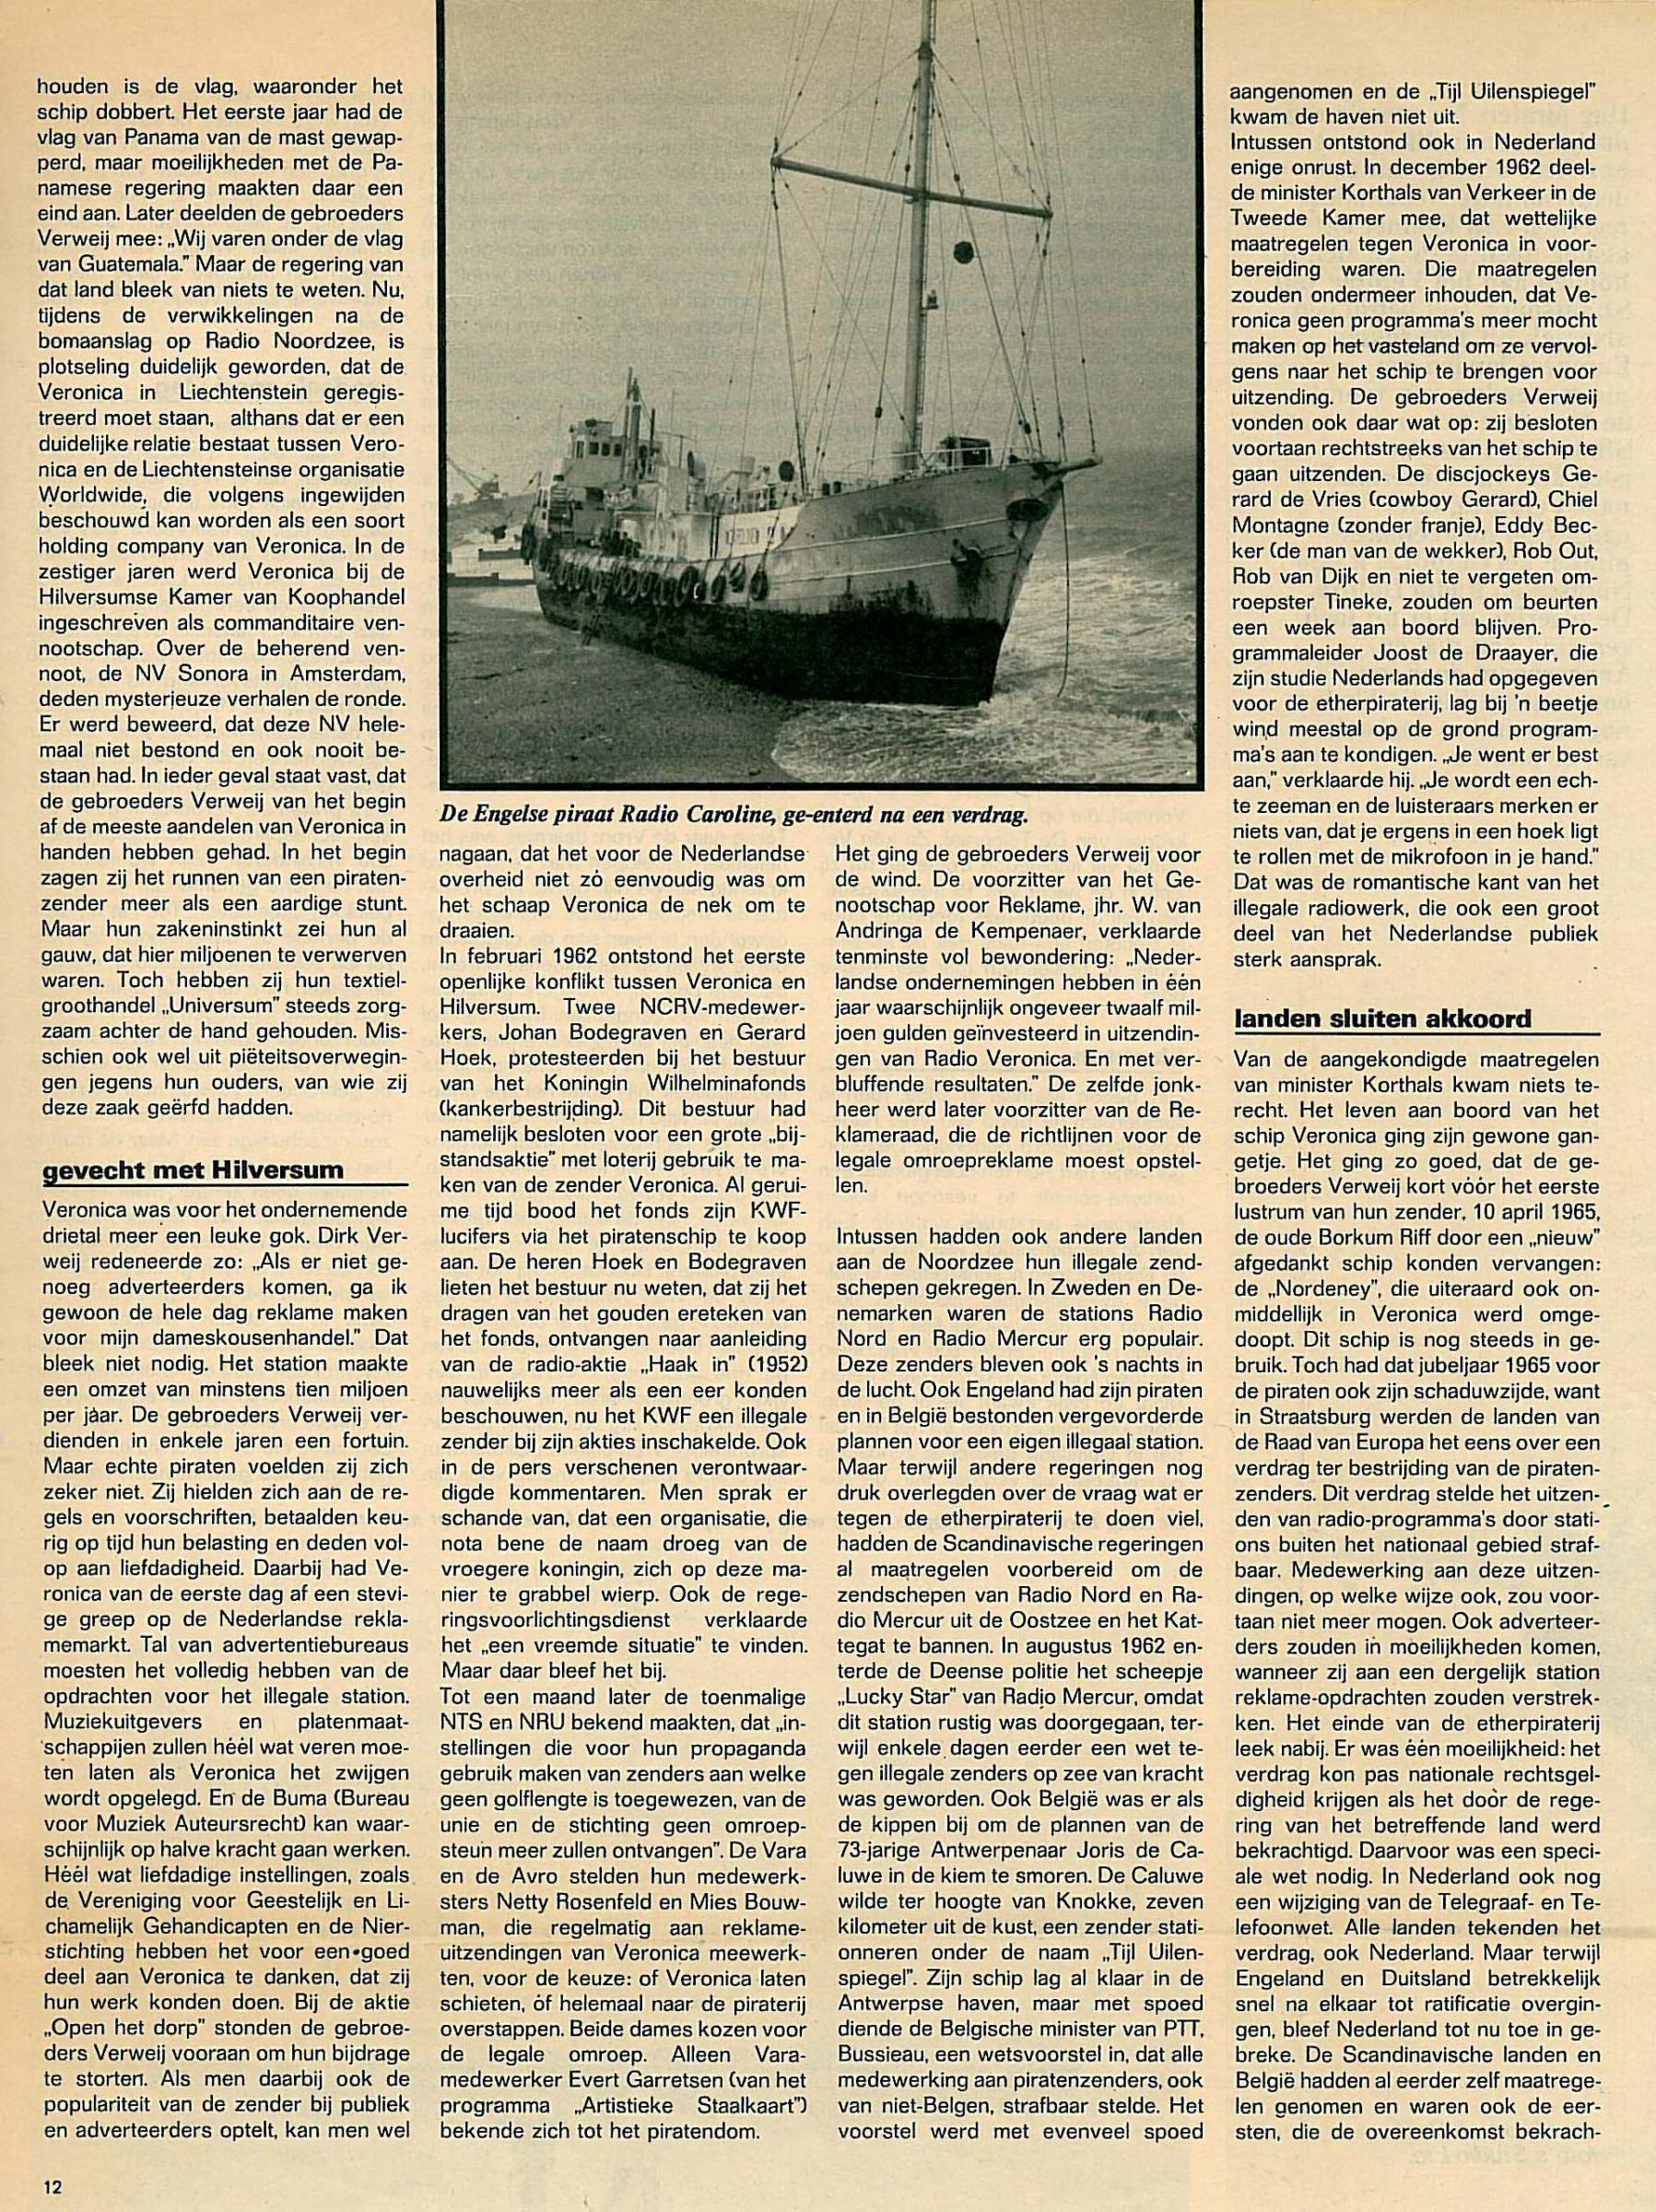 19710626 evt_Studio_Dag piraten Ver_RNI_Cap_Car03.jpg